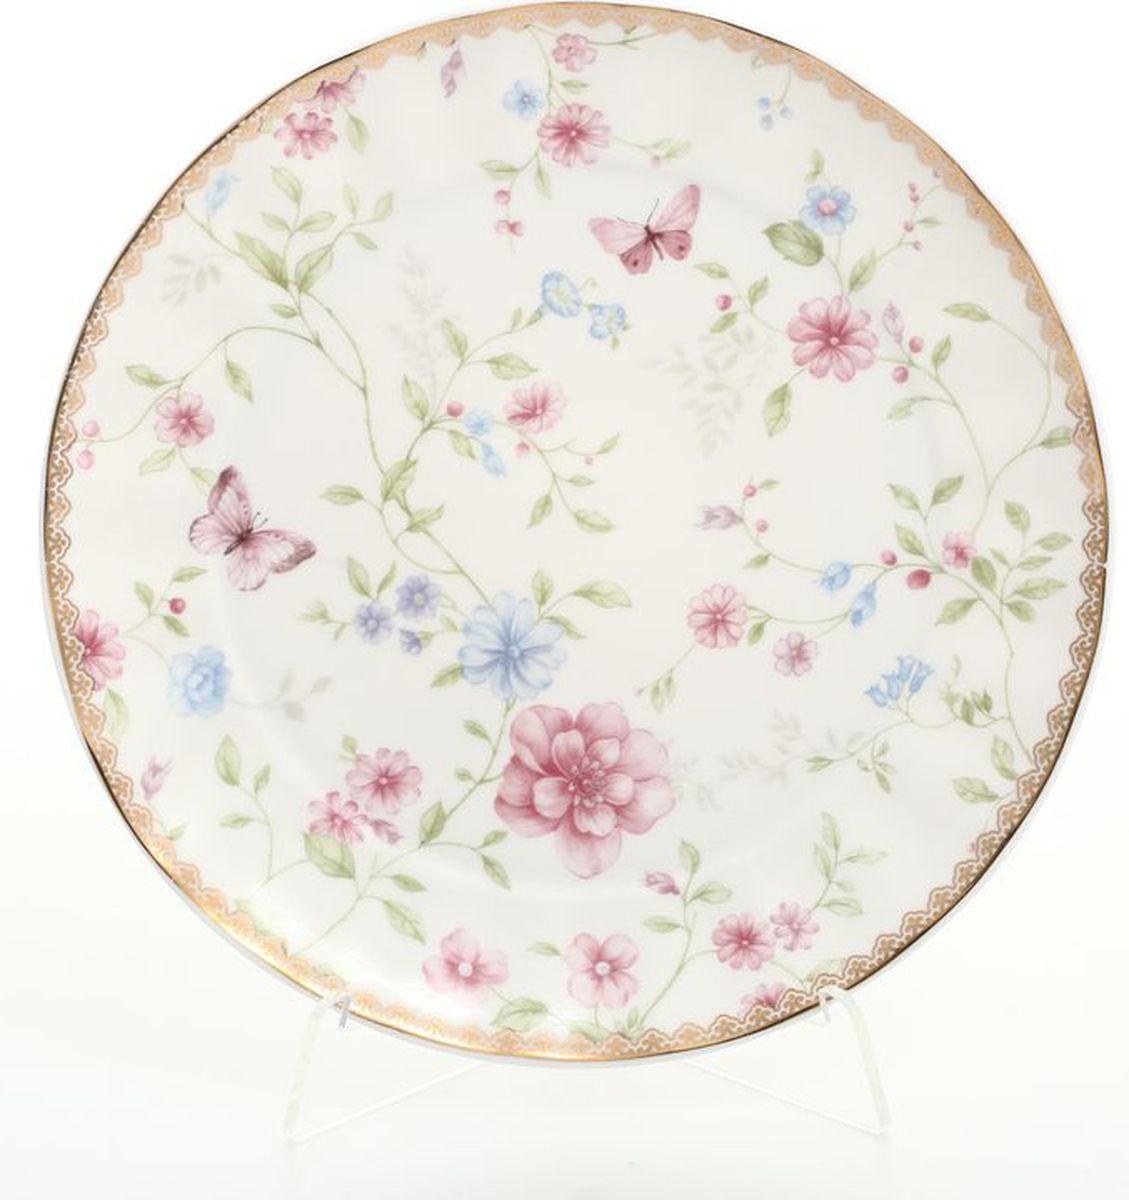 Тарелка Royal Classics, 35622, белый, диаметр 19 см, 6 шт